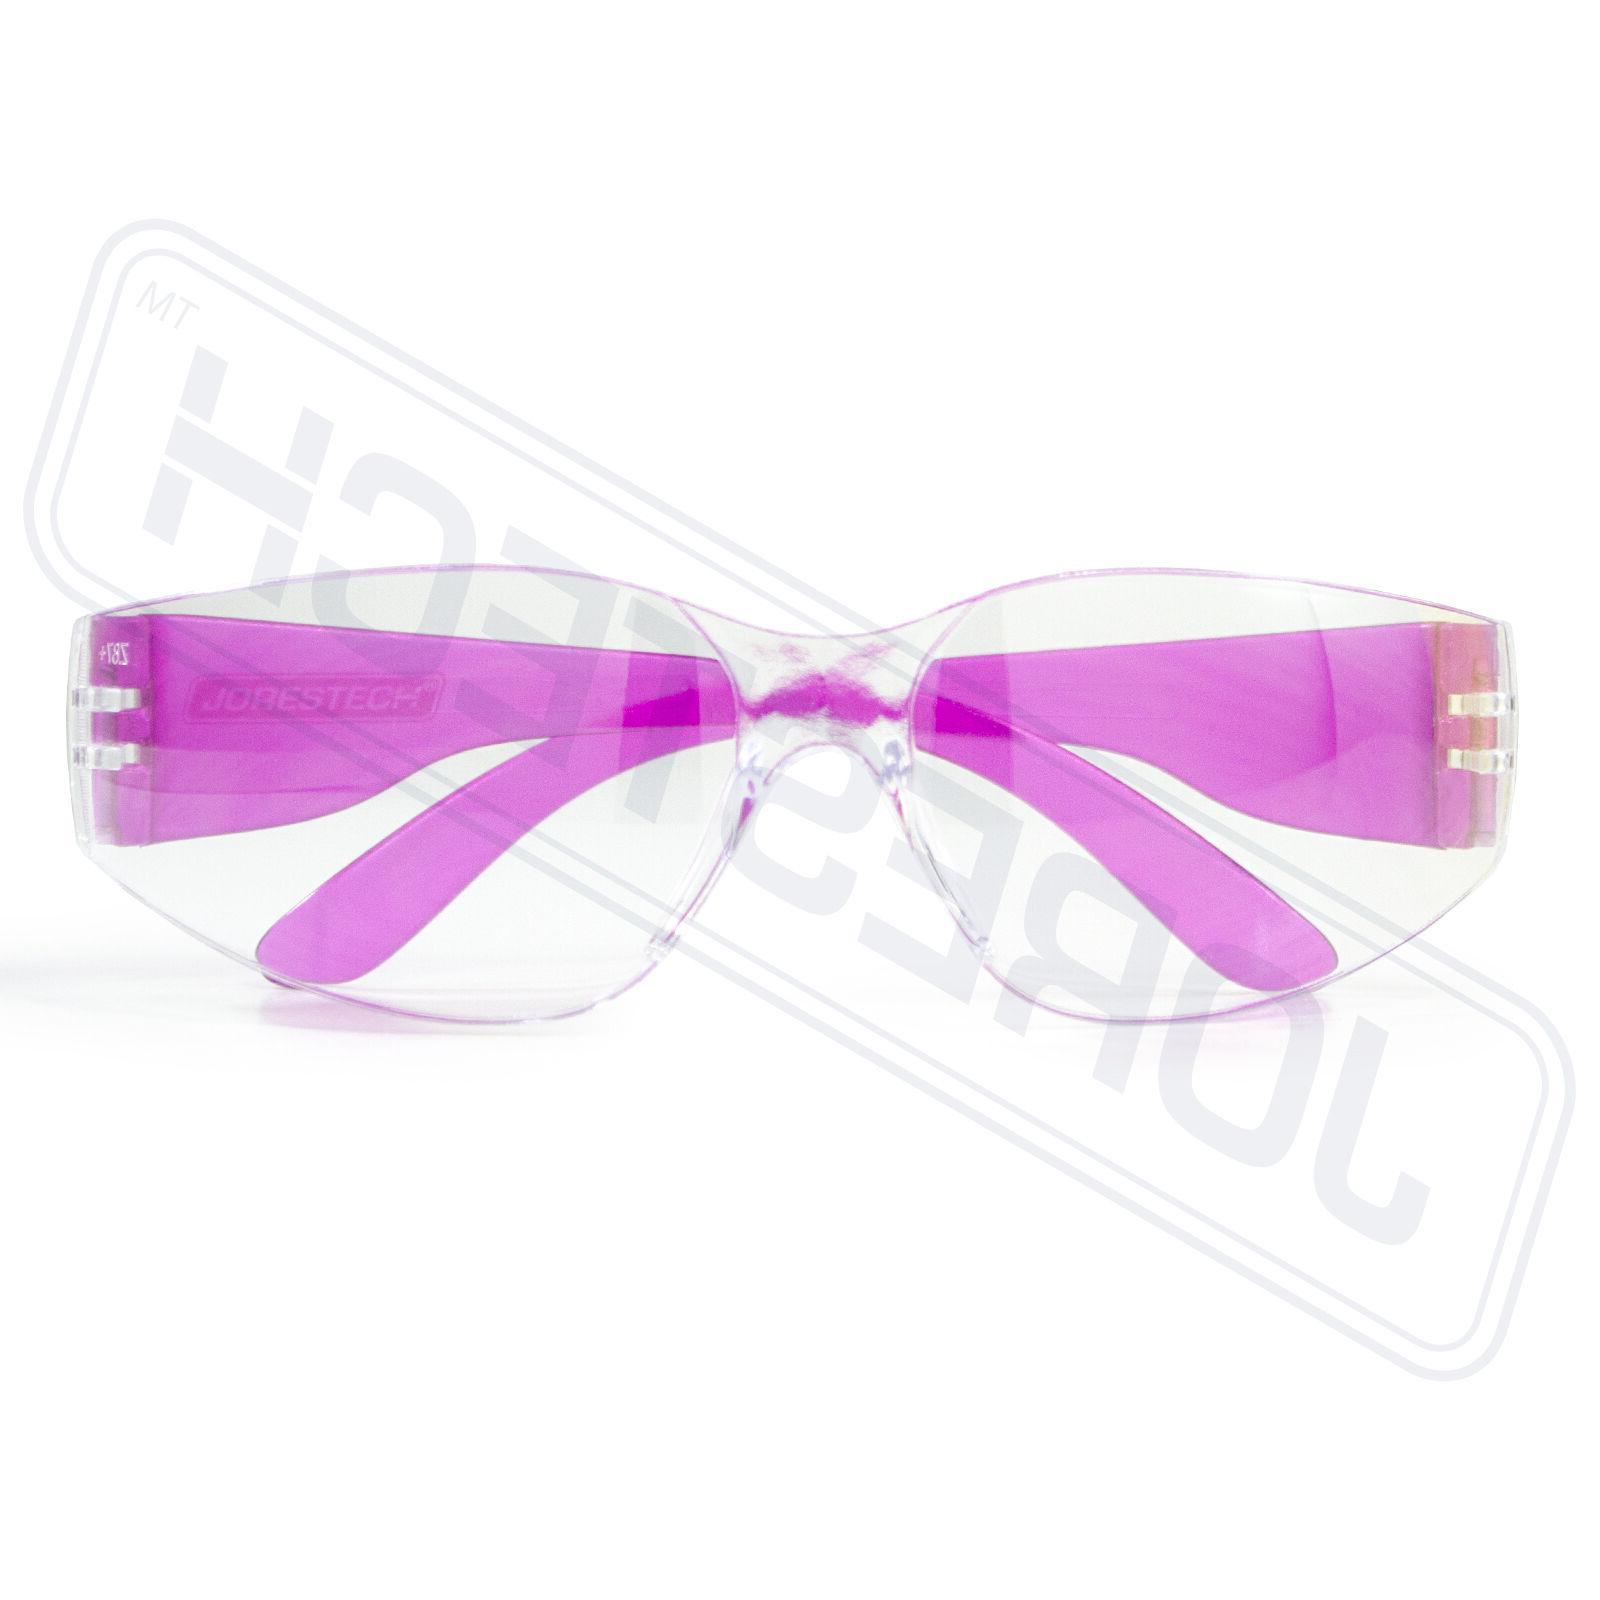 Jorestech Safety Glasses | Pink |